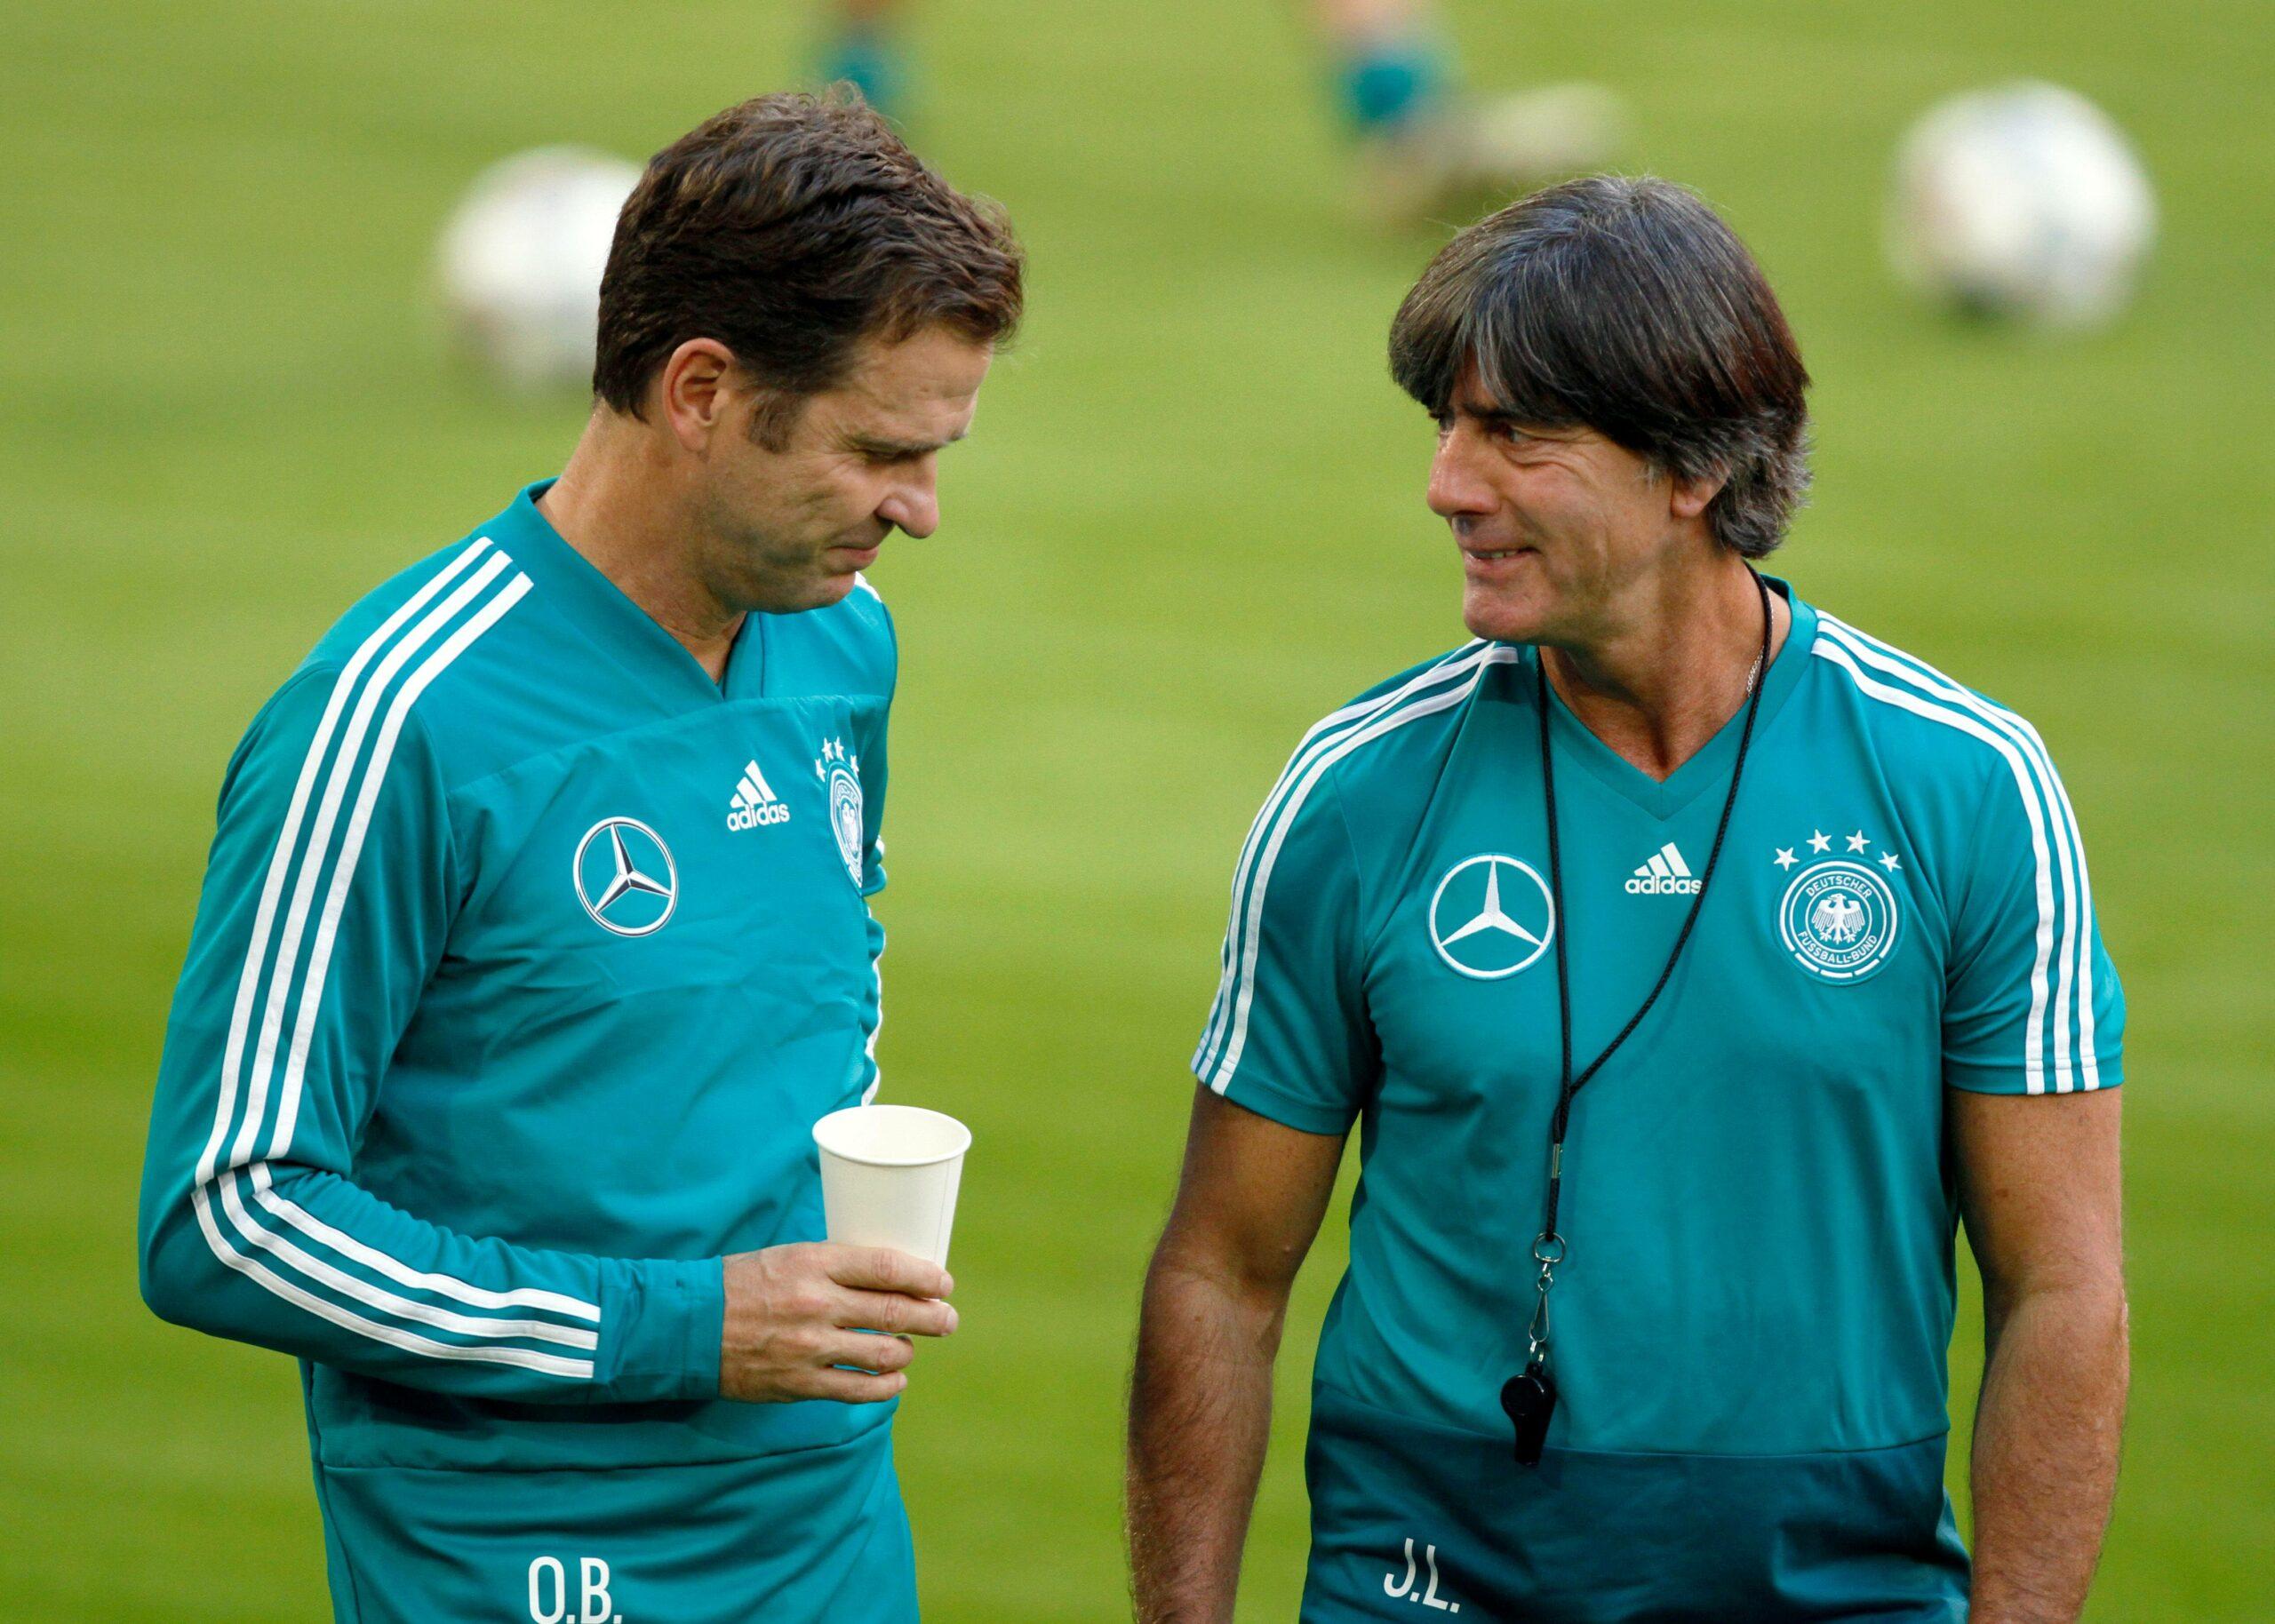 Bierhoff, Löw (DFB) im Training